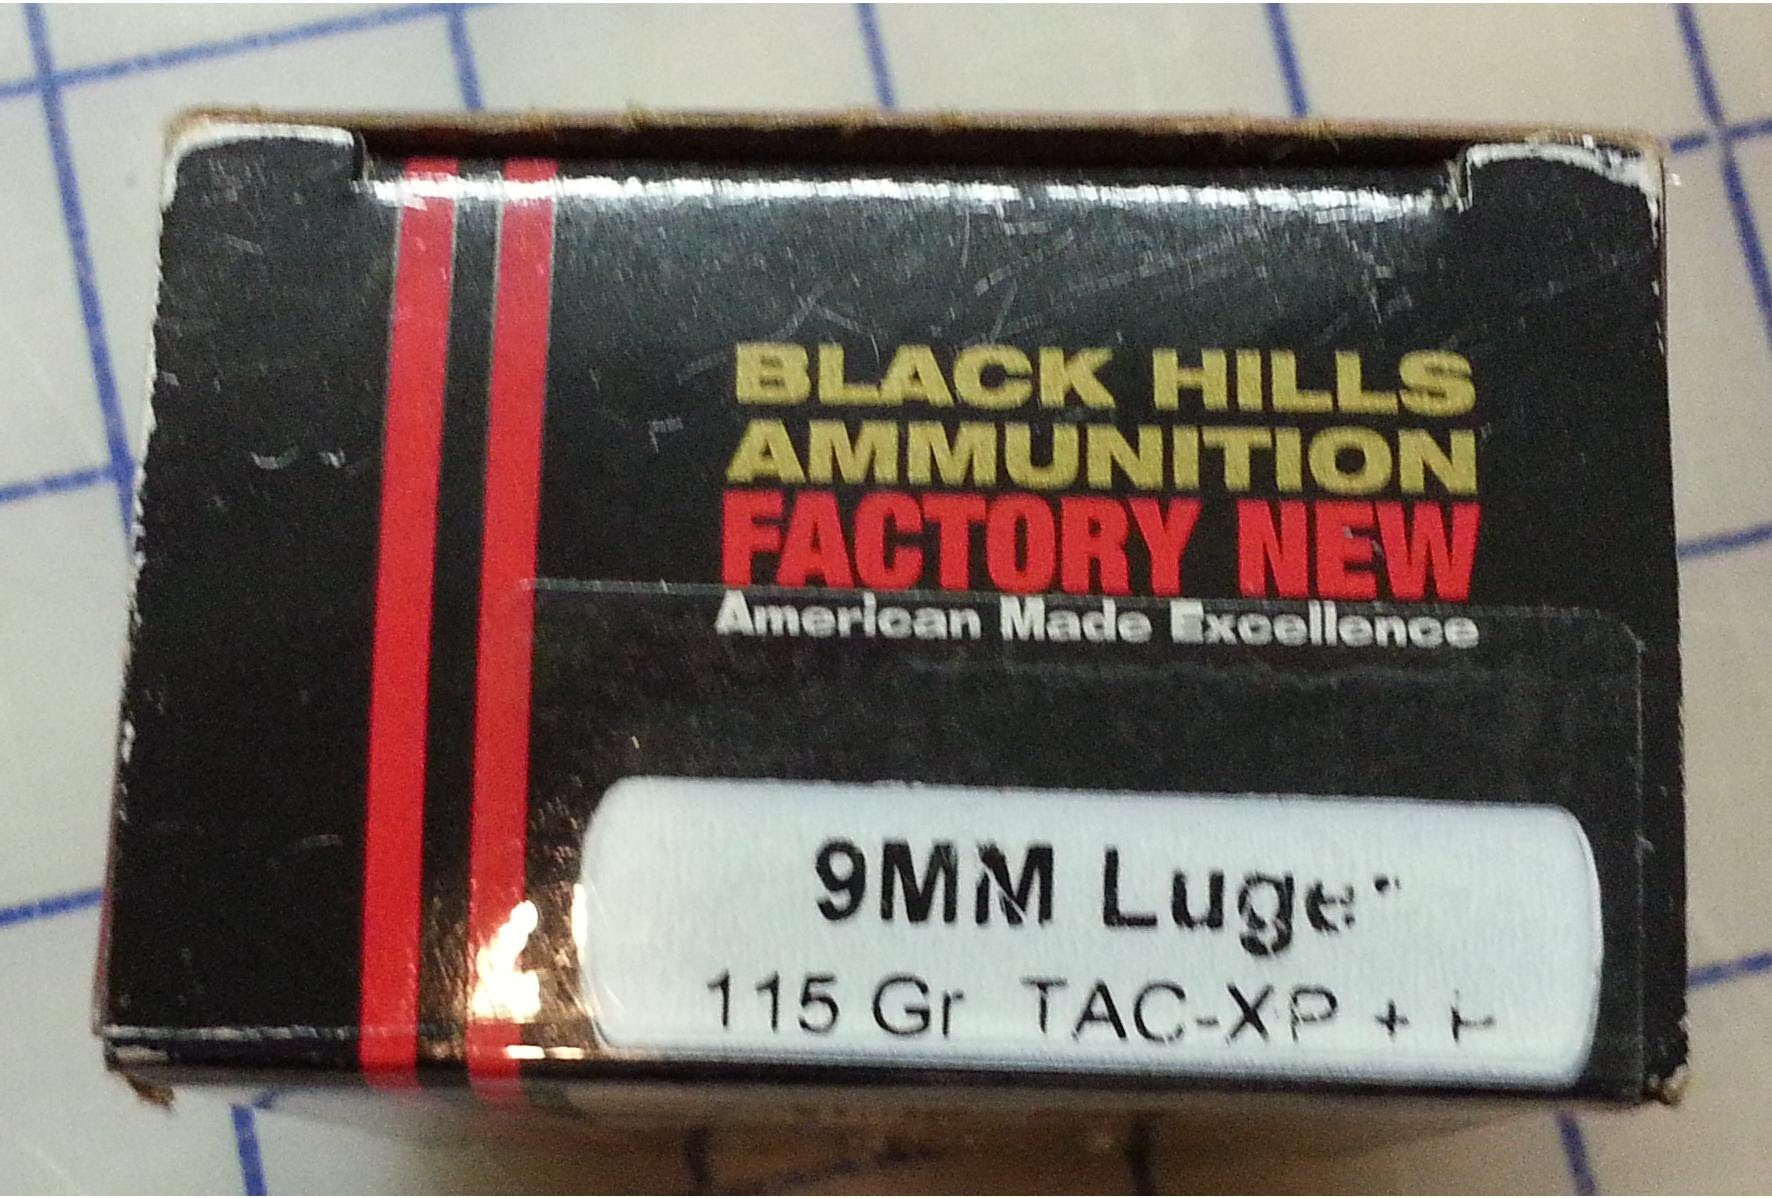 Black Hills Ammo Barnes Tac XP 115 grain 9mm Luger +P Ballistic Gel Test